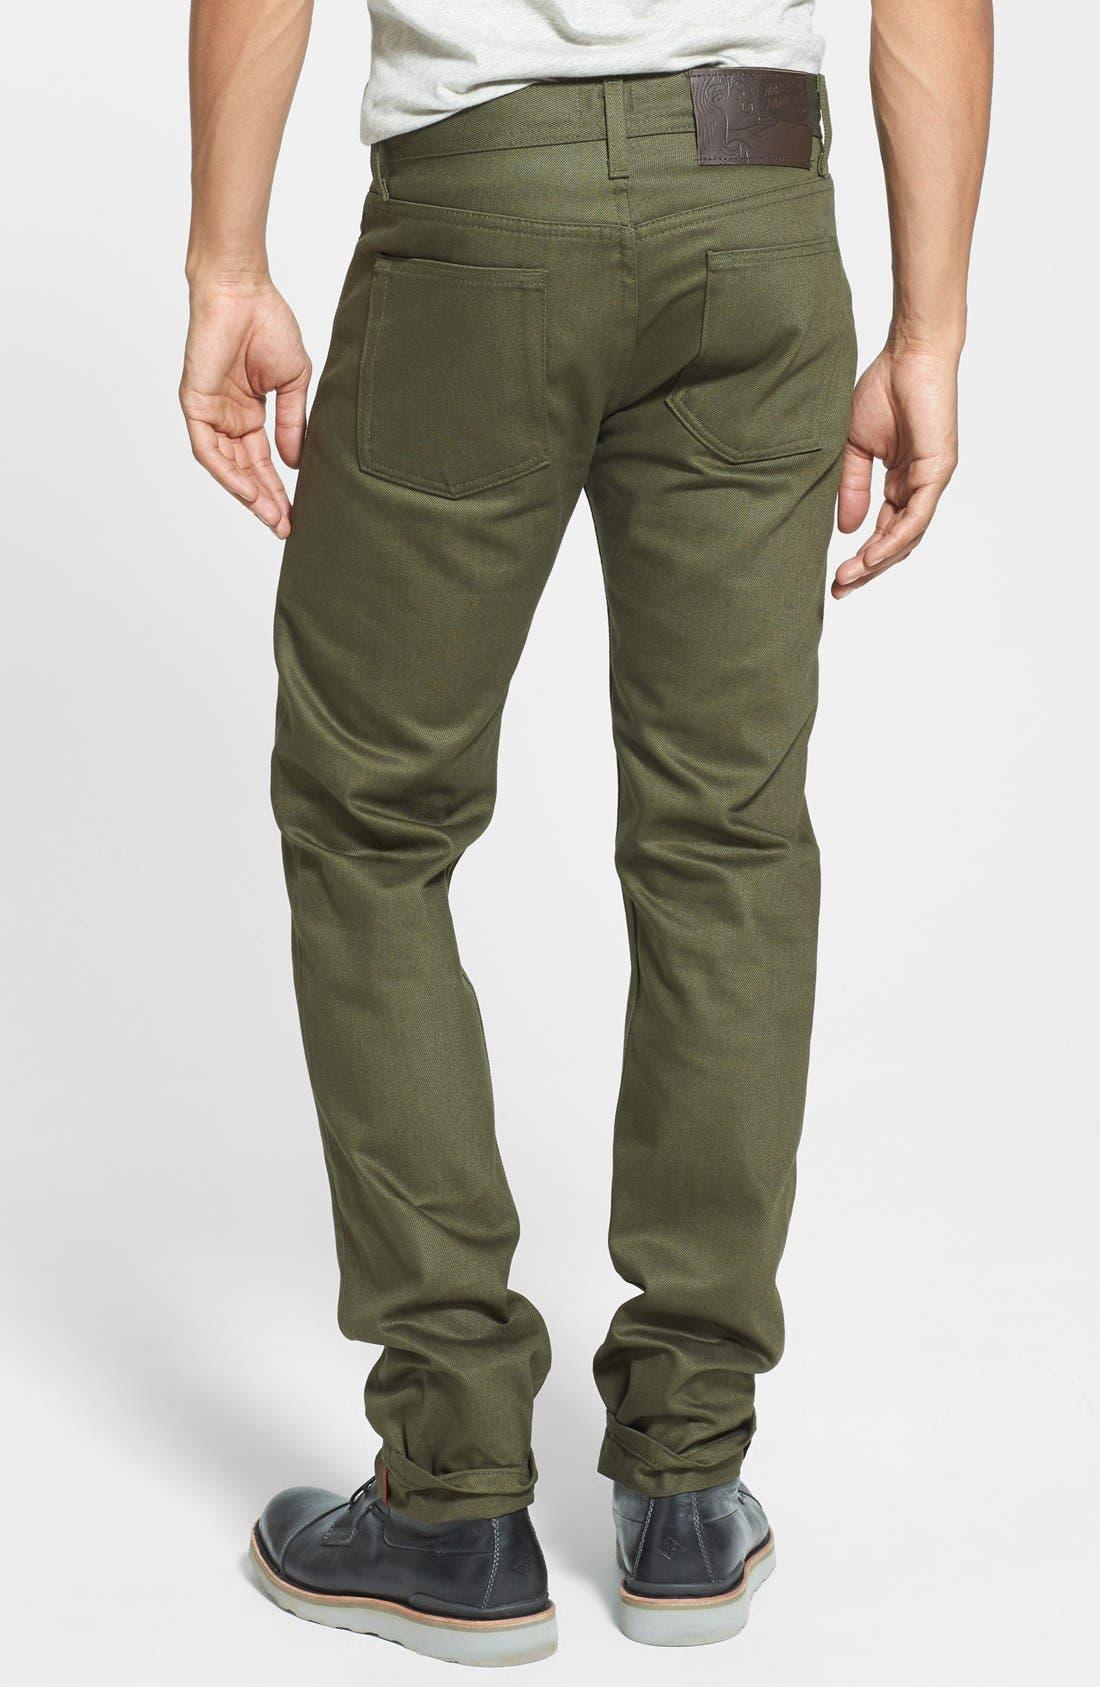 'Weird Guy' Slim Fit Jeans,                             Alternate thumbnail 2, color,                             Khaki Green Selvedge Chino